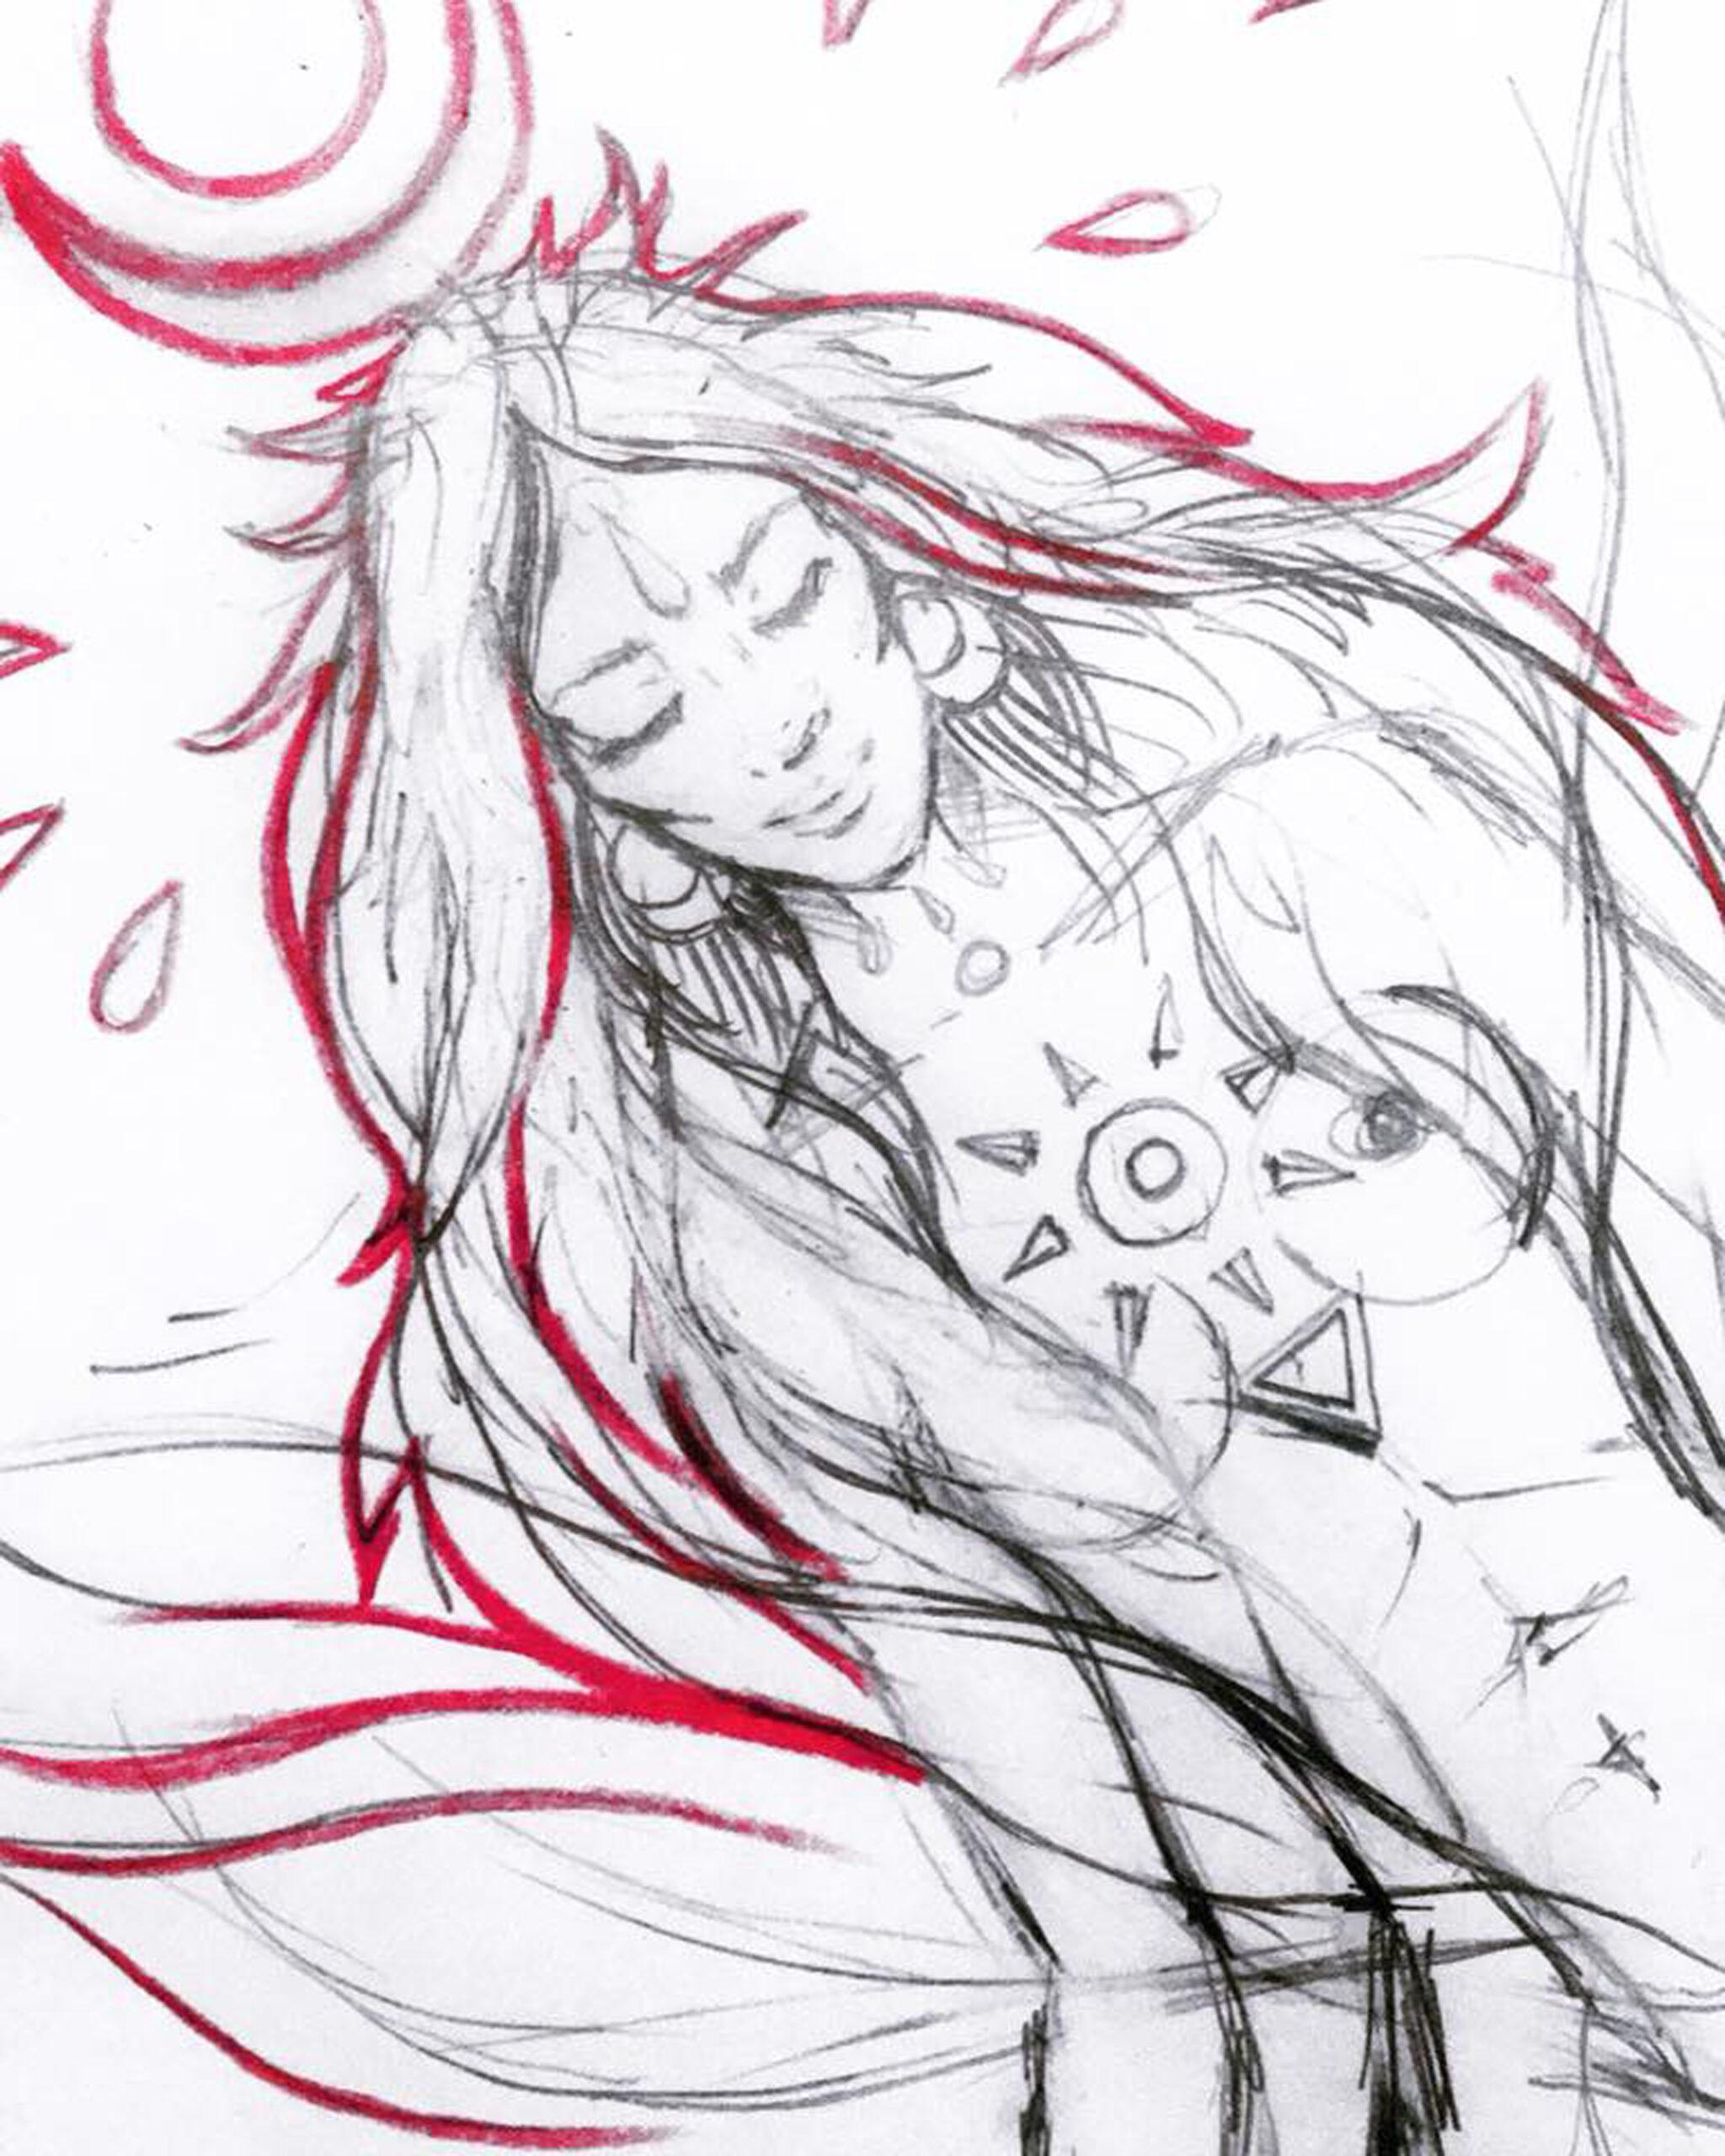 03.35x35-Lakshmi-ViorikaZagorowska-ArtForSale.sketch